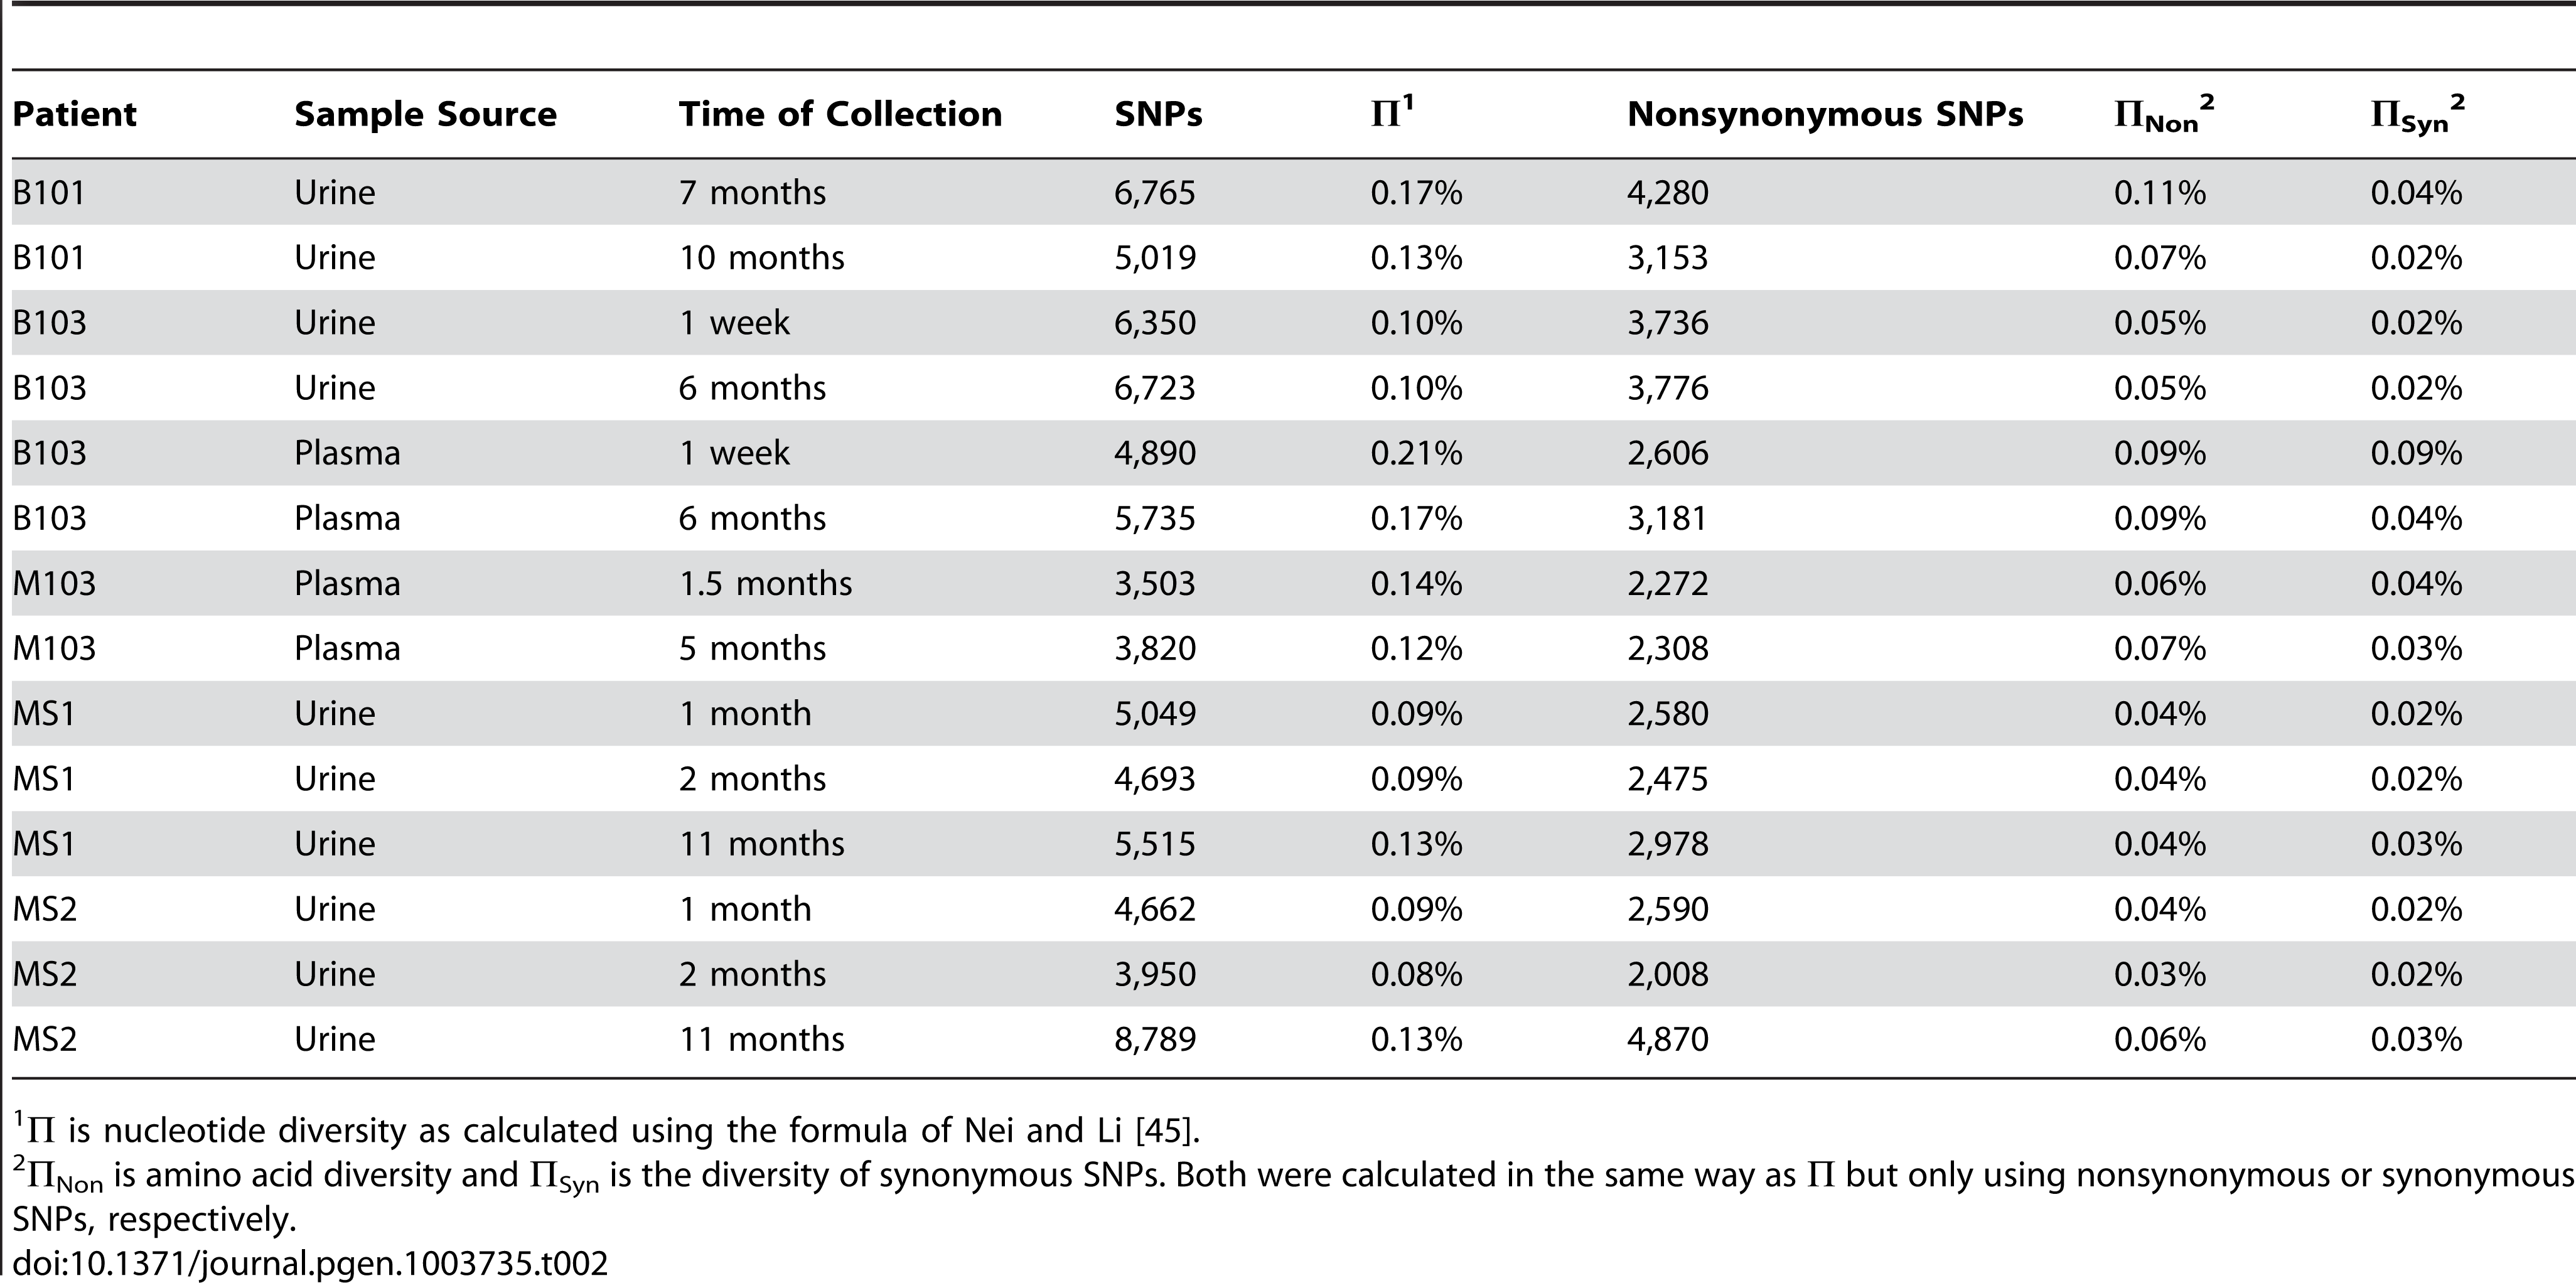 Genome wide summary statistics for HCMV populations.